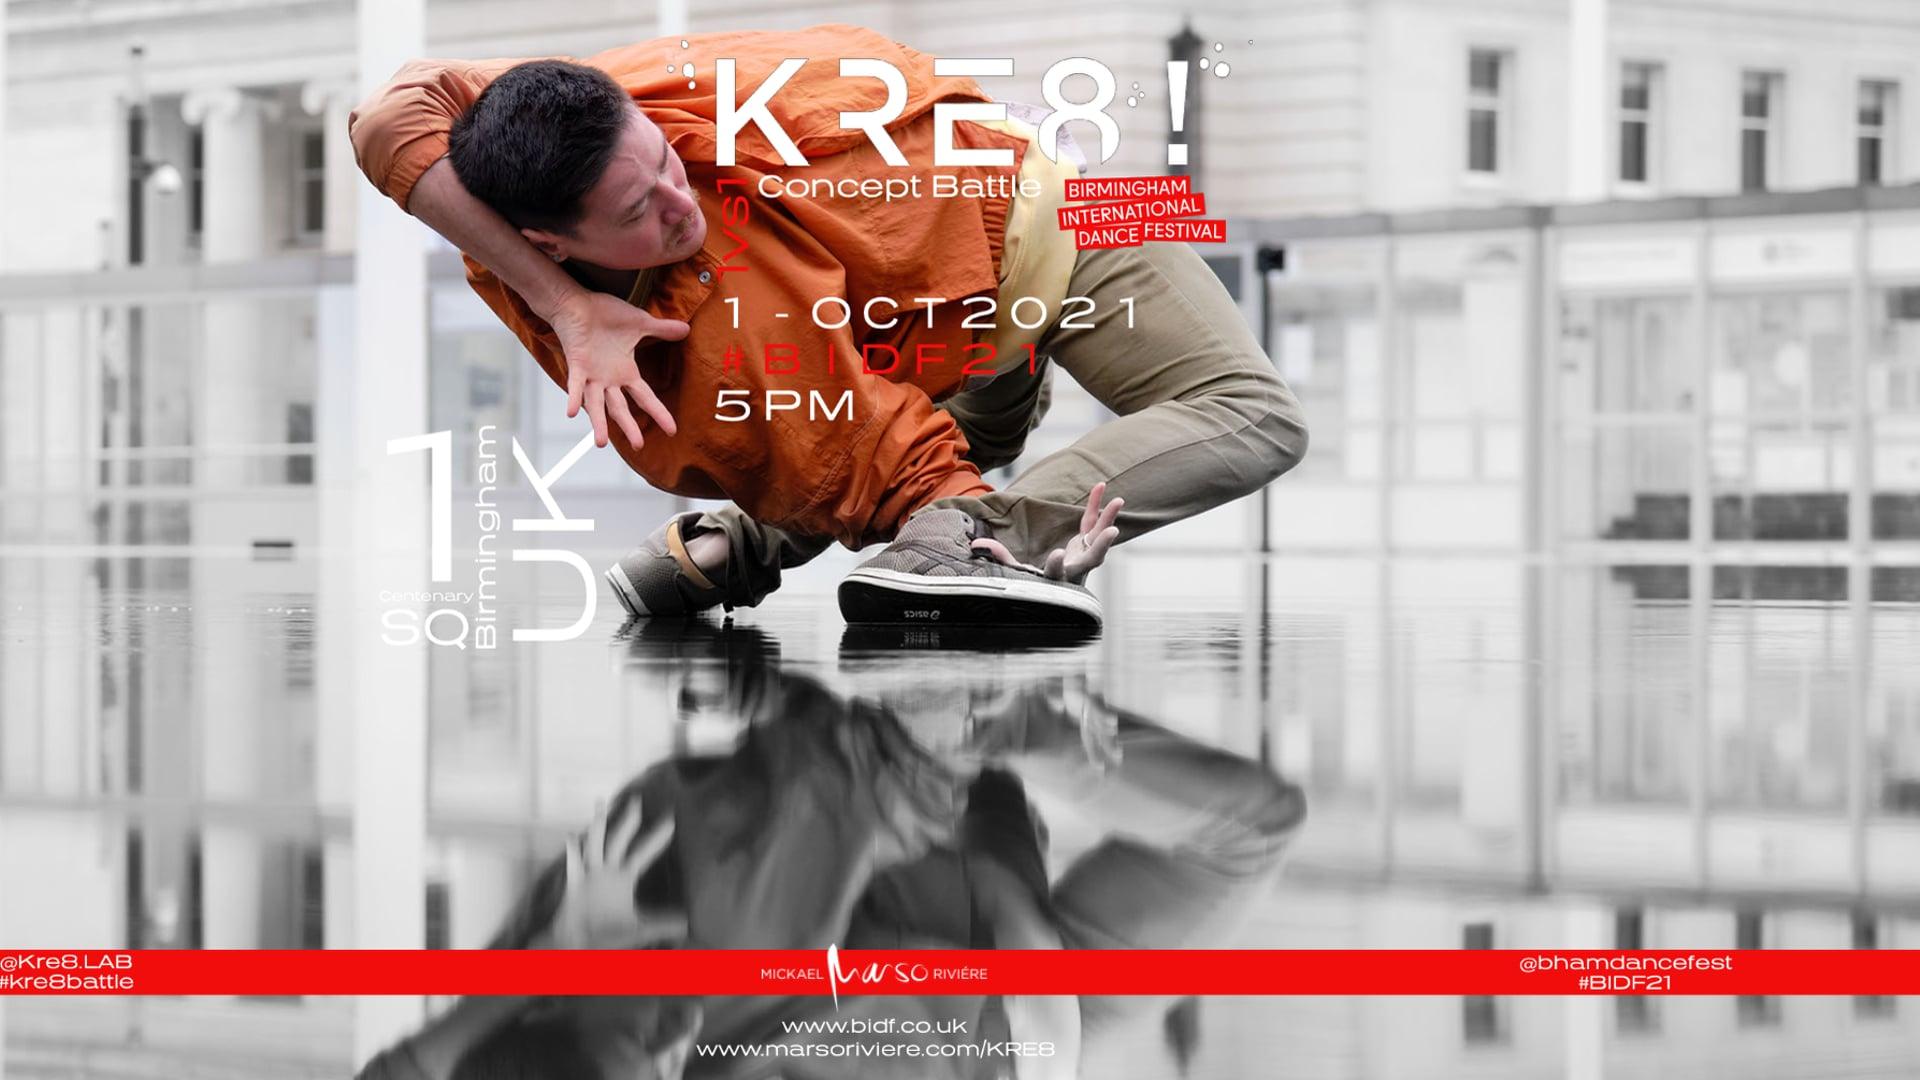 KRE8! Trailer OCT2021